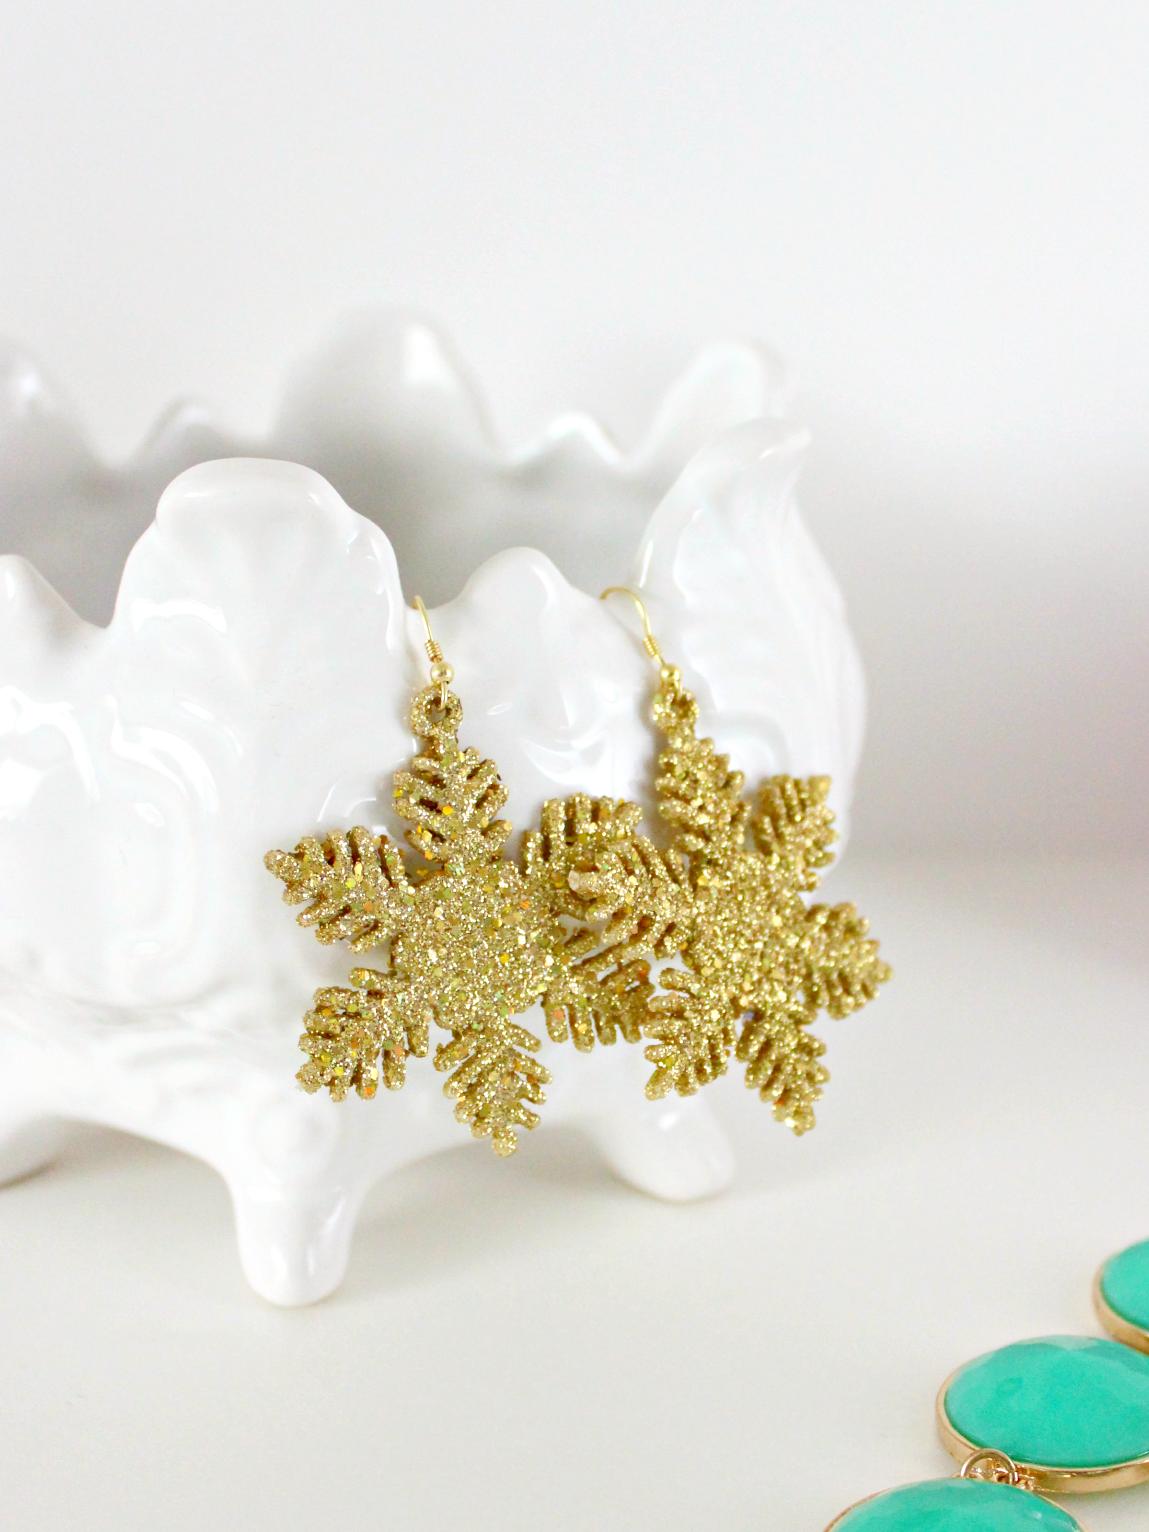 DIY GLITTER & GOLD SNOWFLAKE EARRINGS